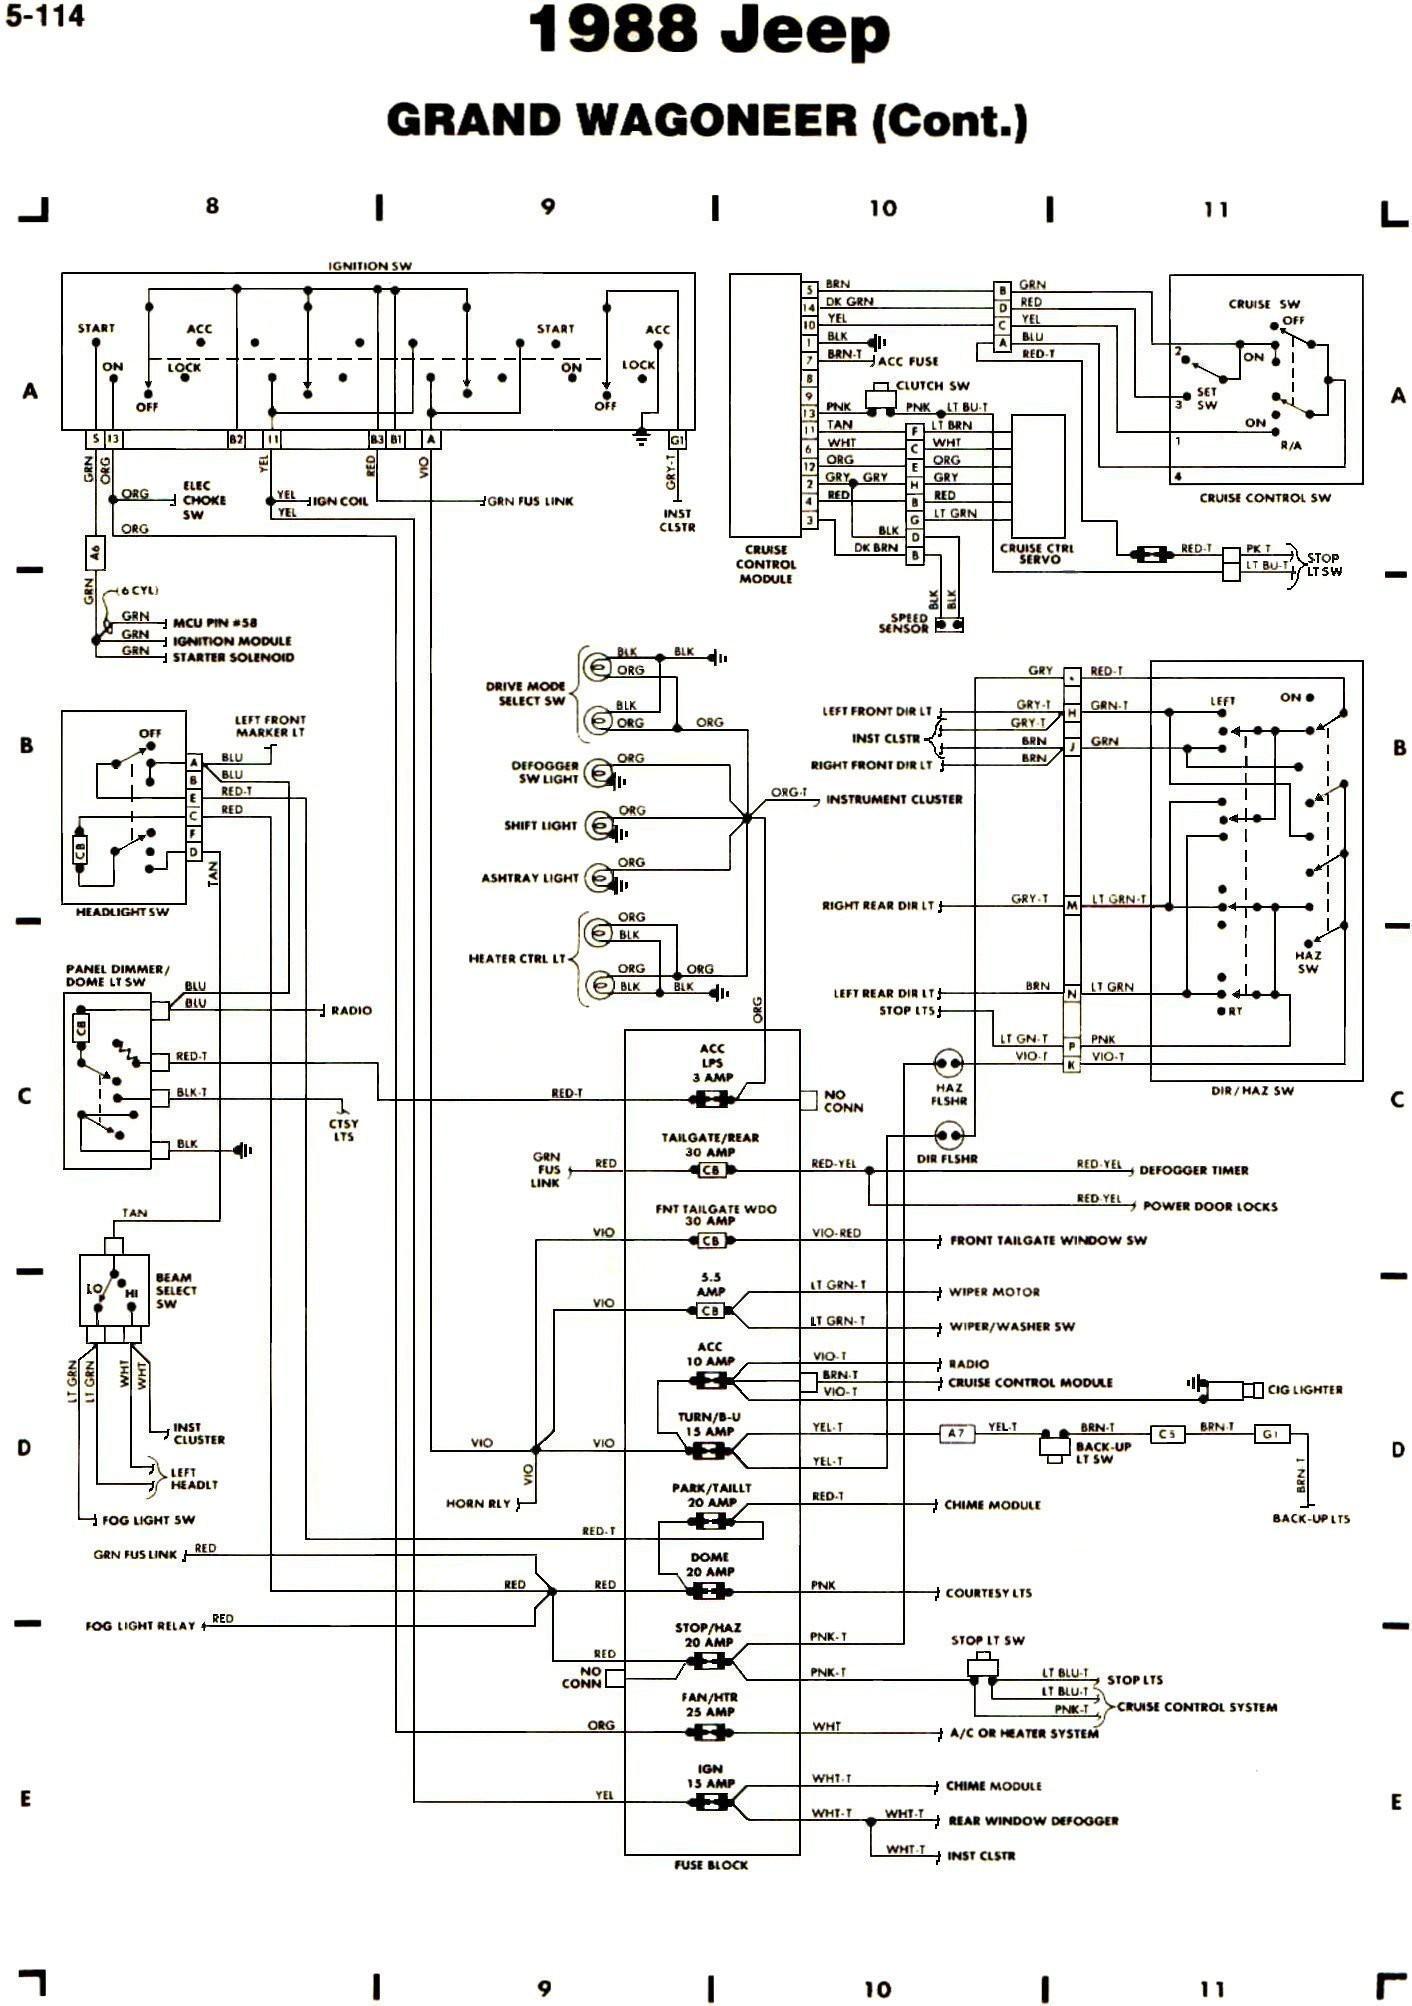 1993 freightliner wiring diagrams circuit diagram symbols u2022 rh veturecapitaltrust co Freightliner RV Wiring Diagram Freightliner Electrical Wiring Diagrams